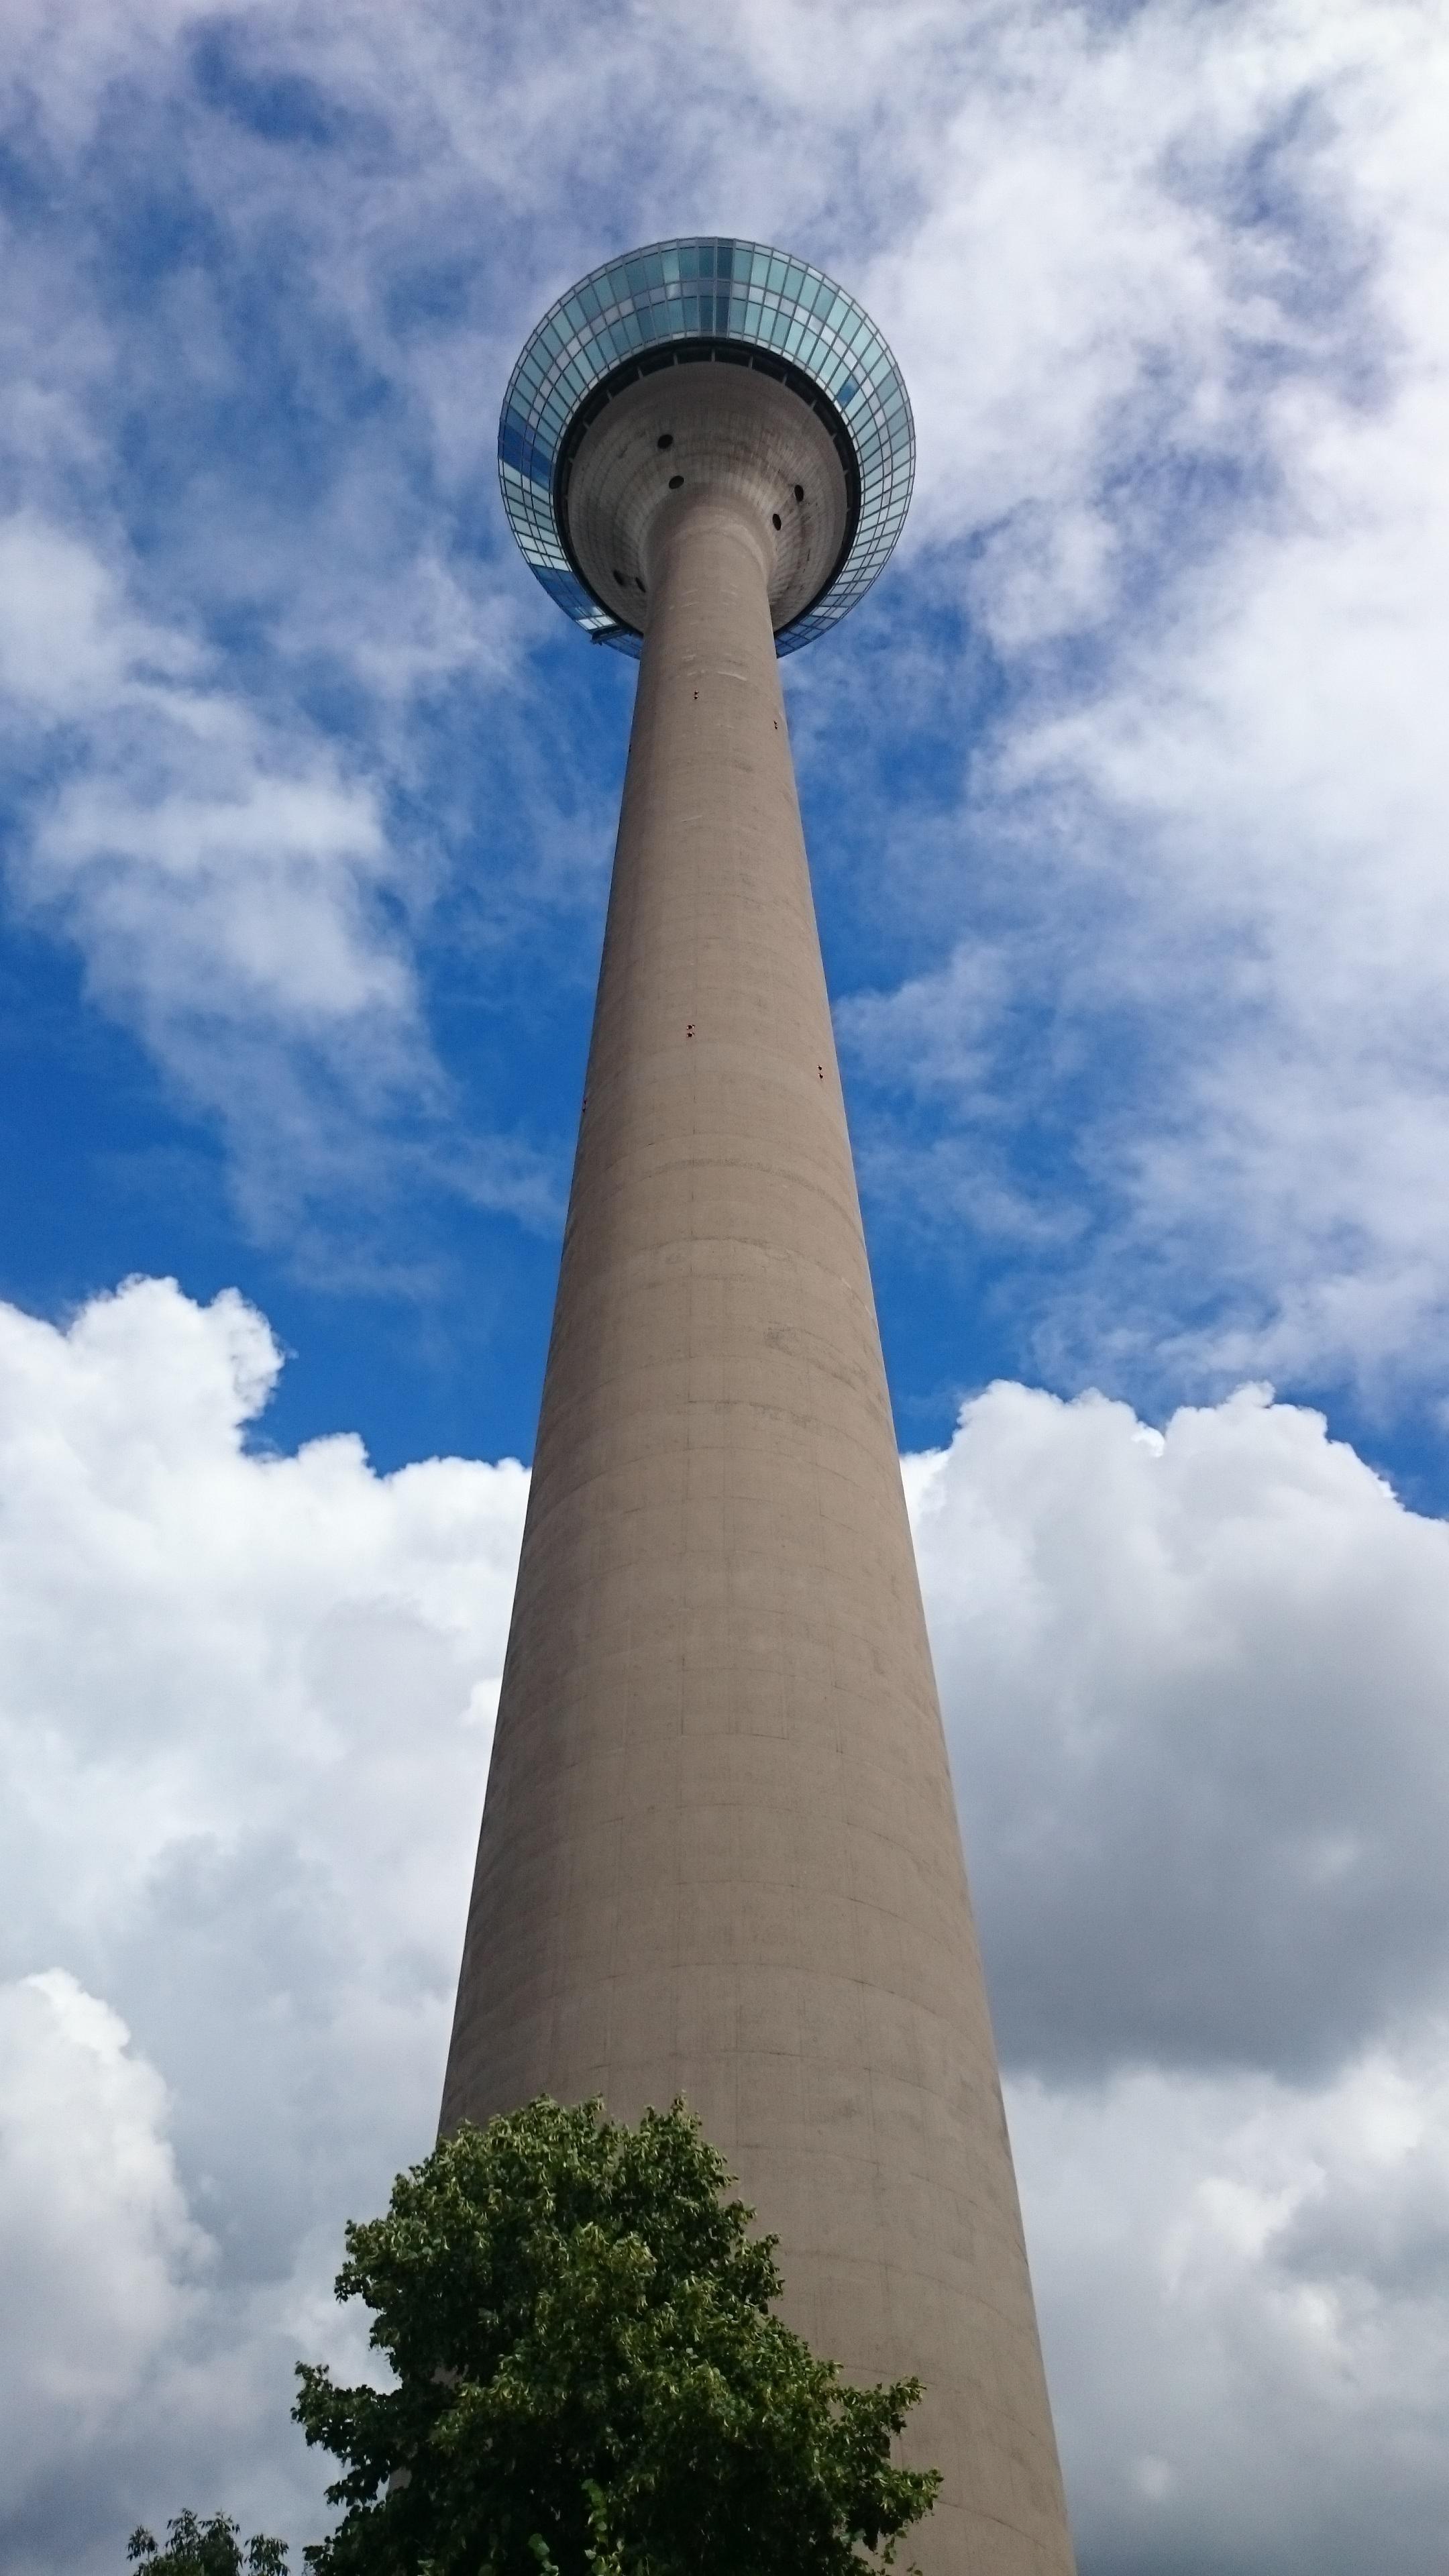 Fotos Gratis Nube Arquitectura Estructura Cielo